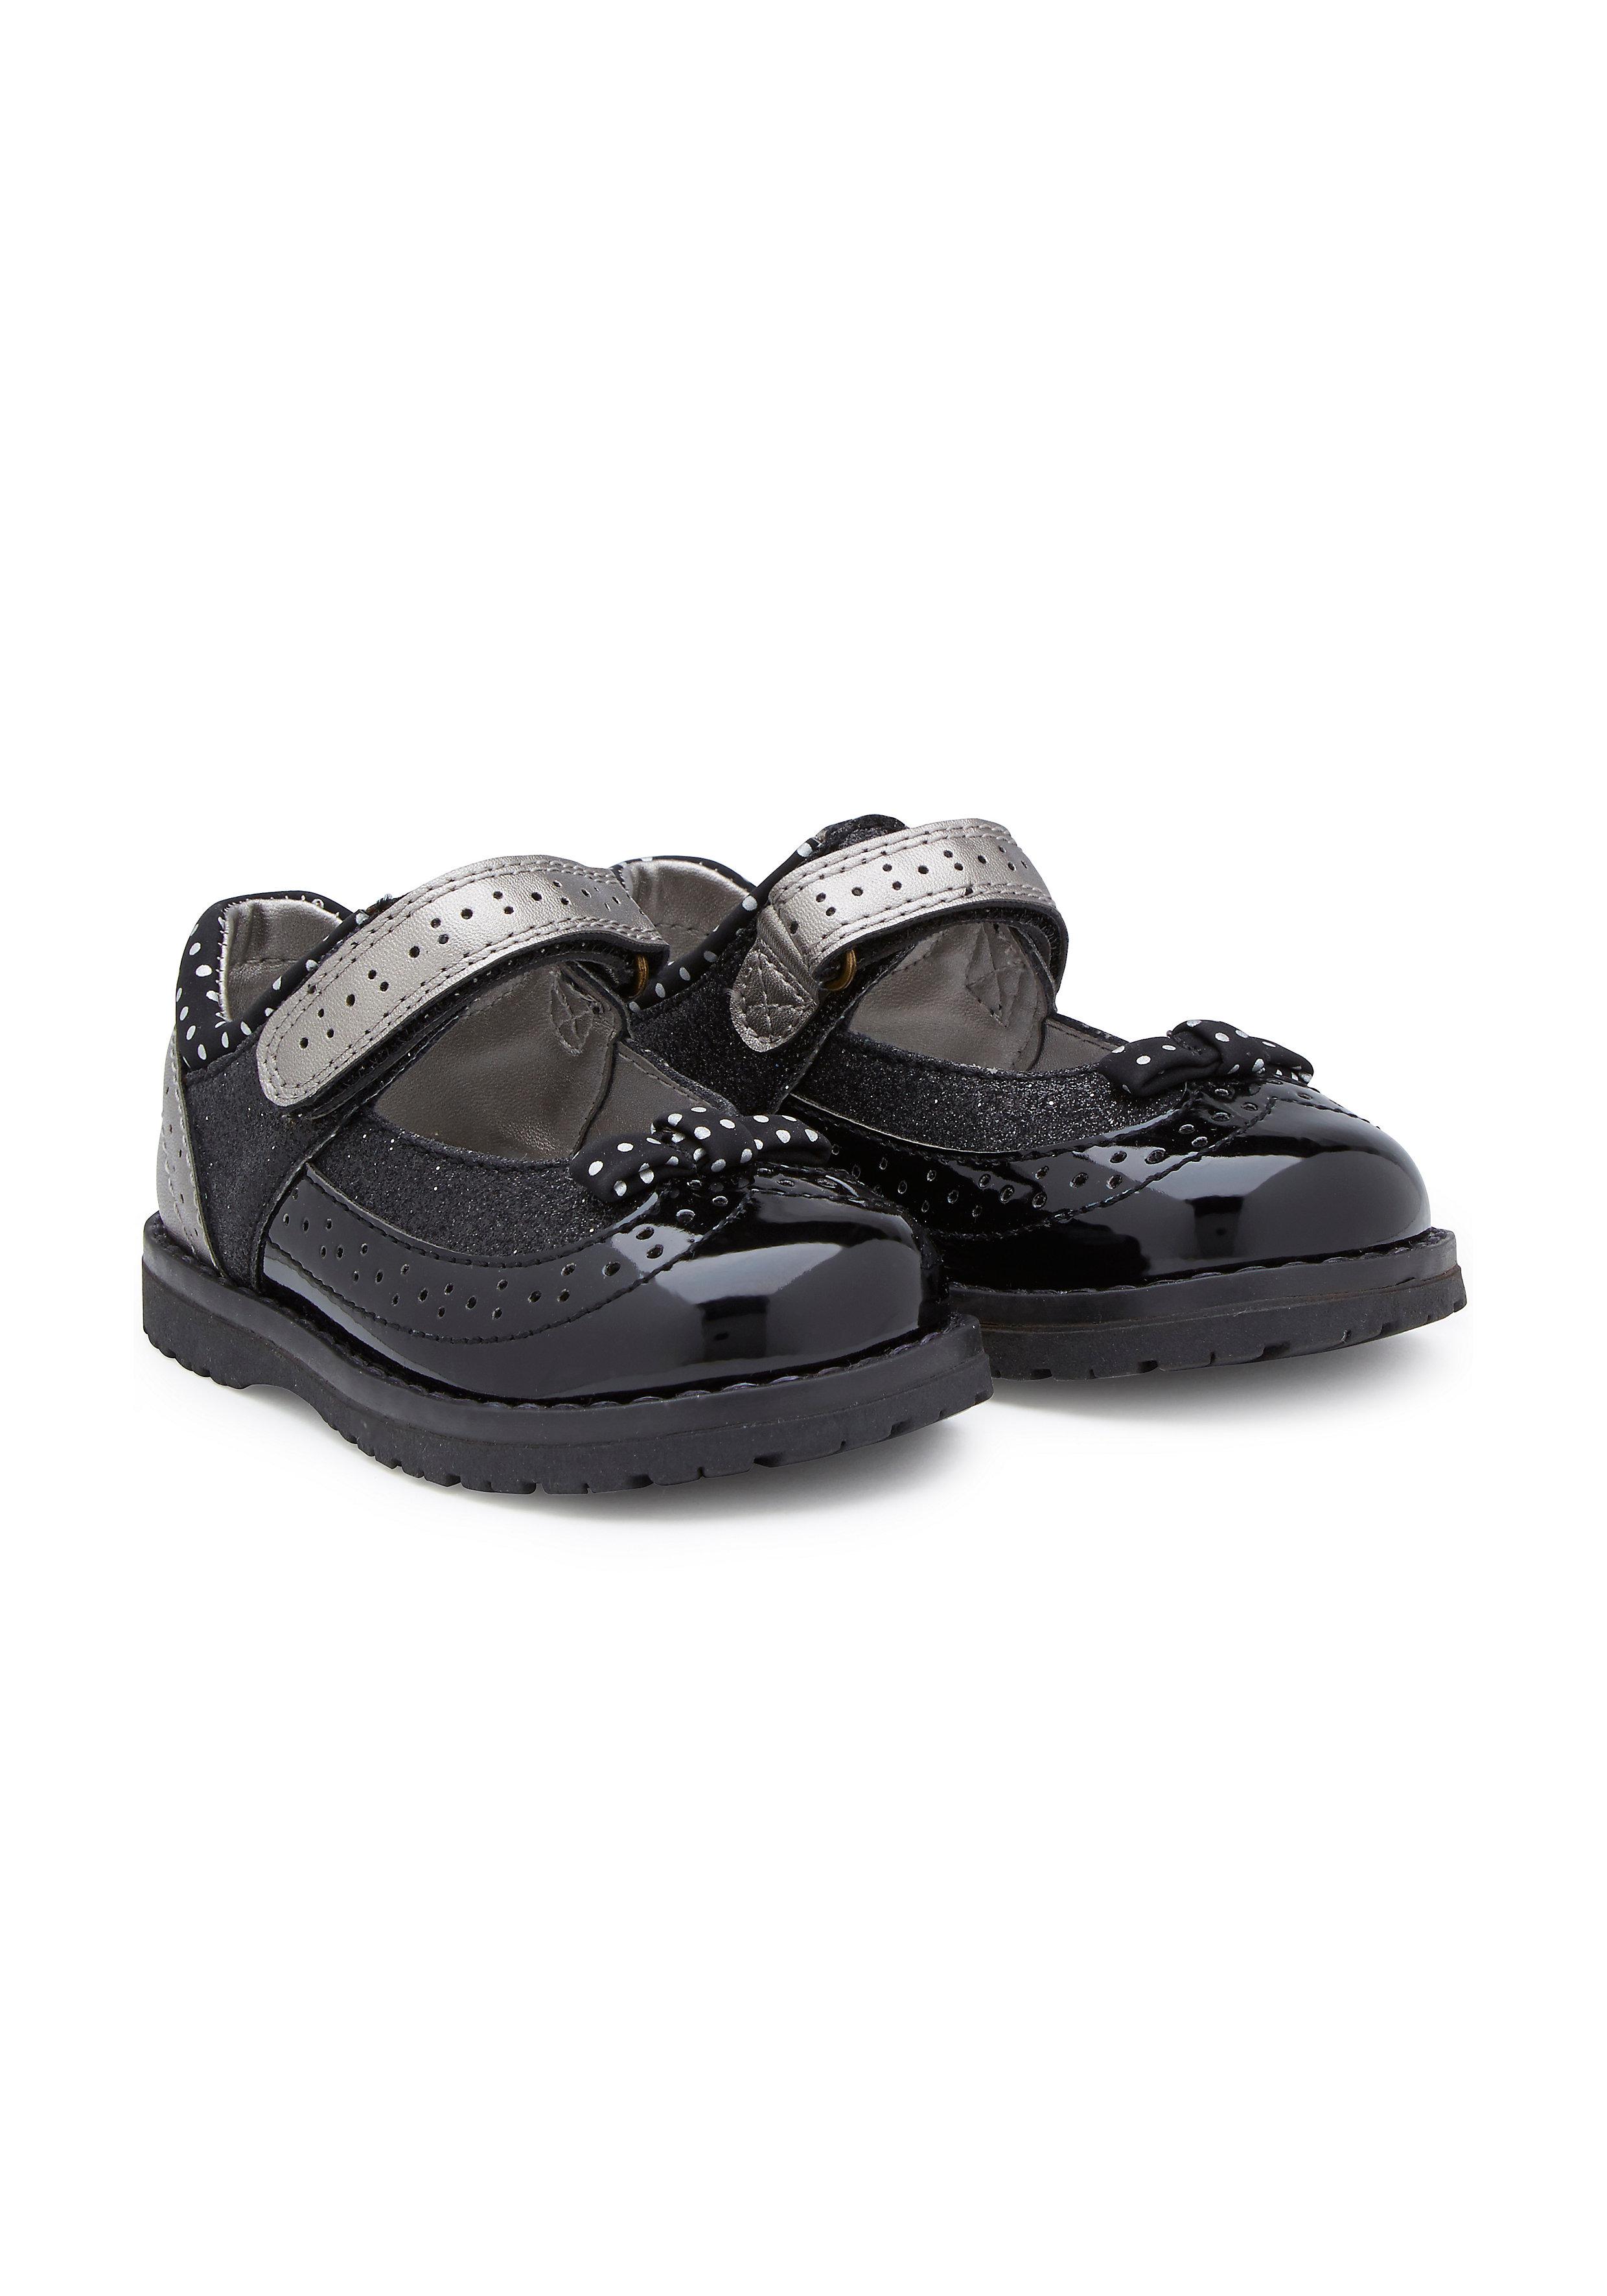 Mothercare | Girls Spot Shoes - Black